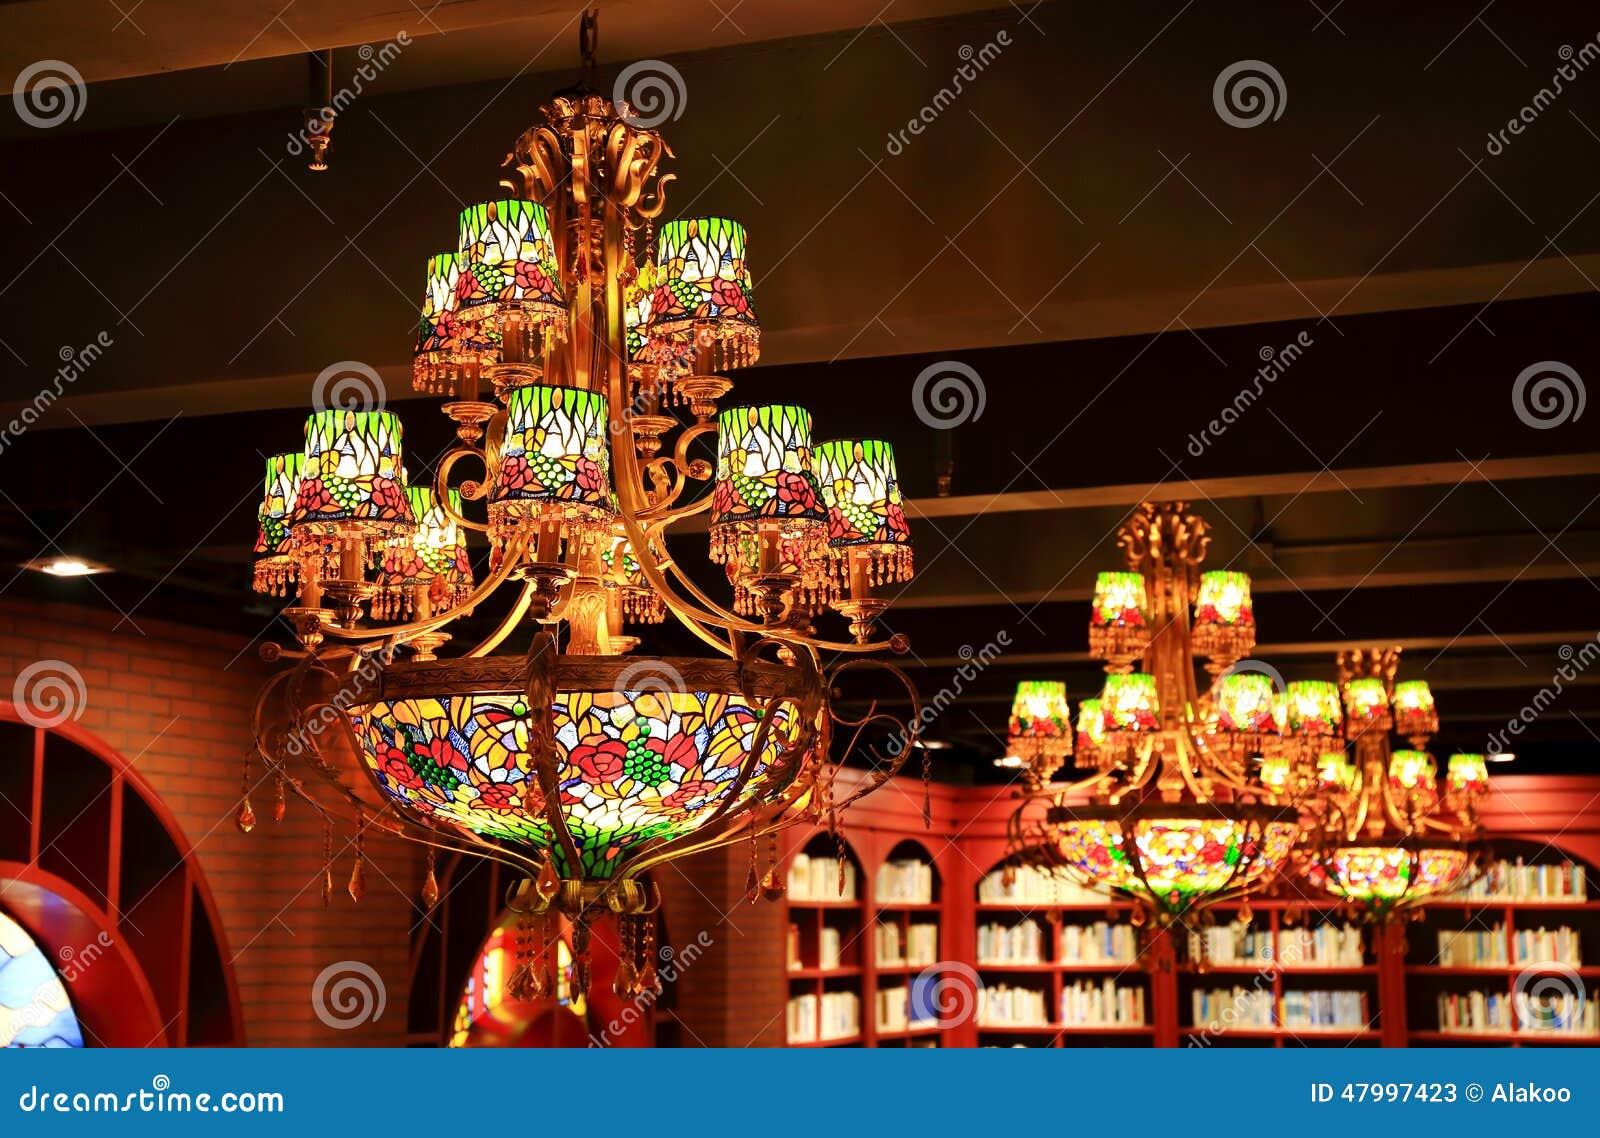 Vintage chandelier ceiling lamp pendant light room lighting stock vintage chandelier ceiling lamp pendant light room lighting arubaitofo Image collections